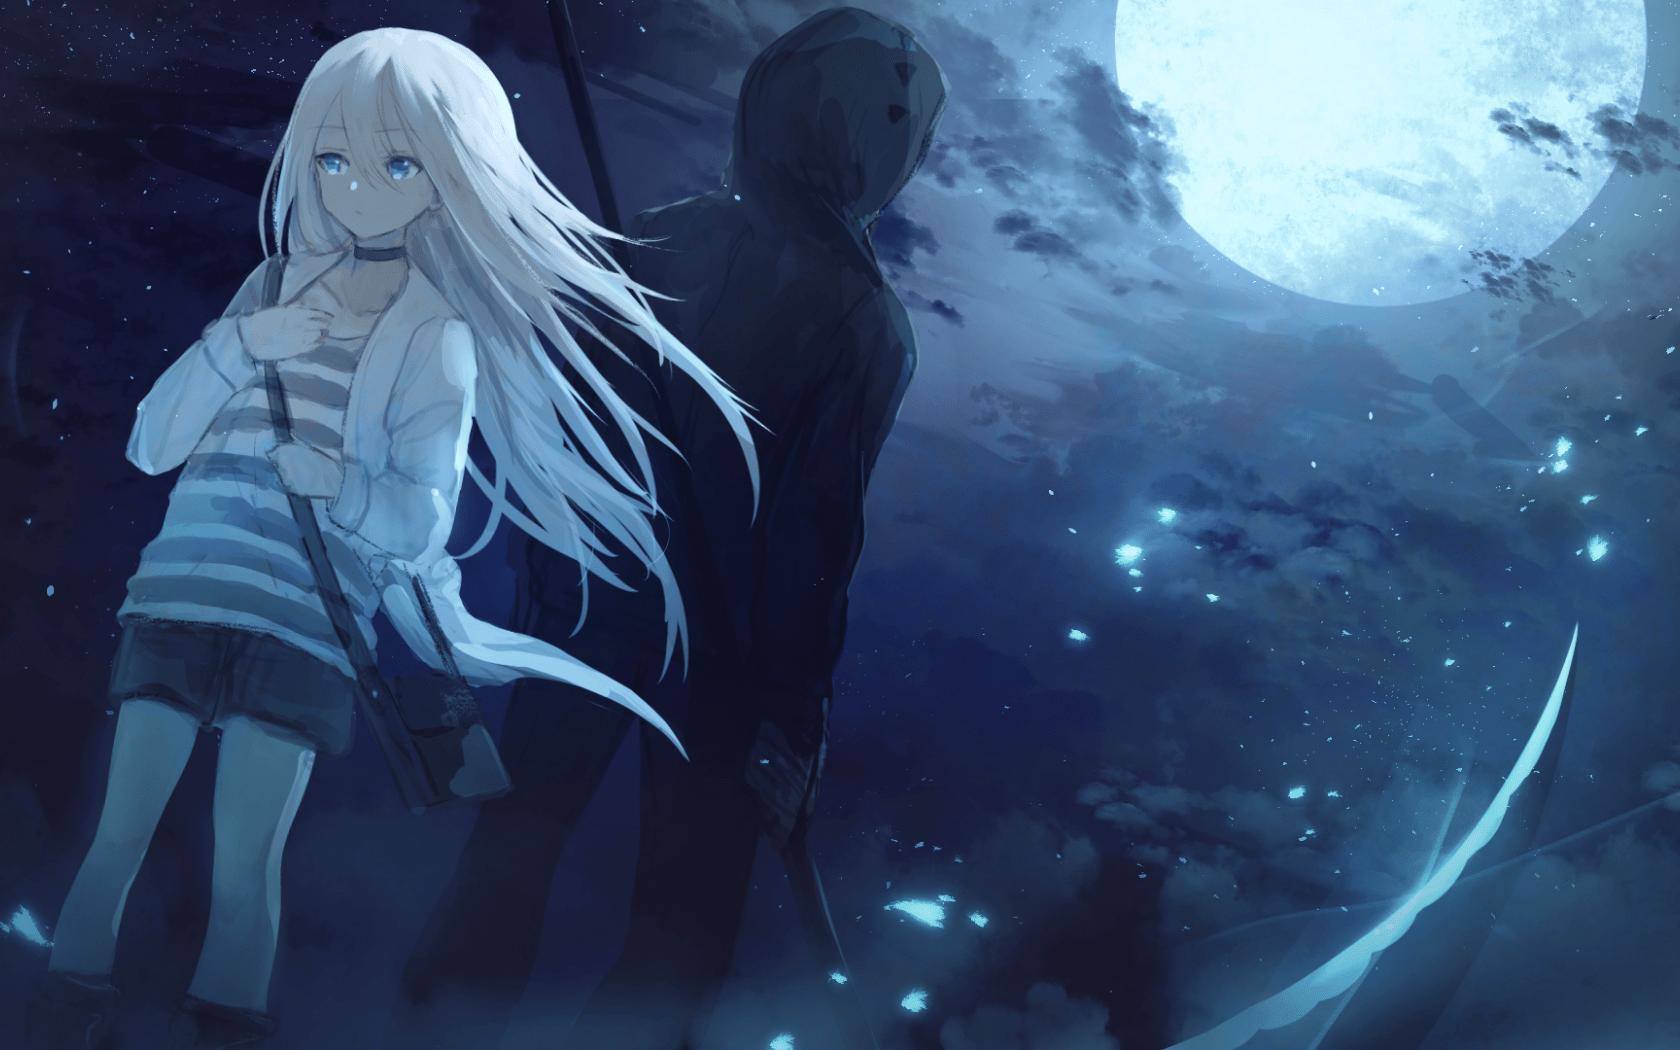 1680x1050 Tải xuống miễn phí Angel Of Death Anime Live Wallpaper Image